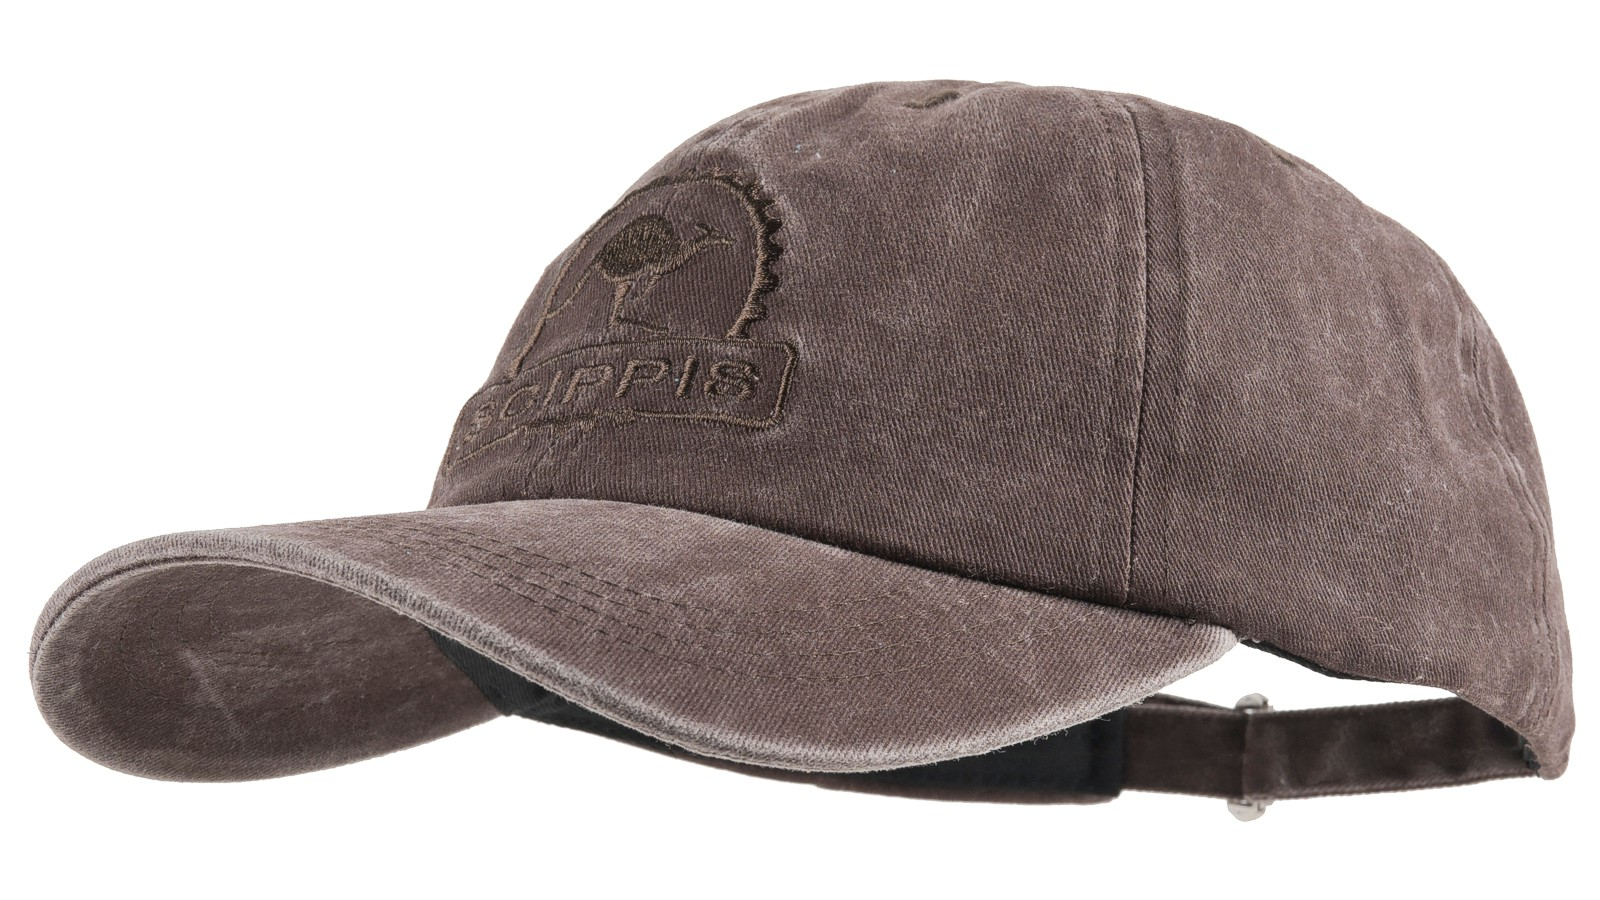 Scippis Baseball-Cap »Scippis Känguru« Braun